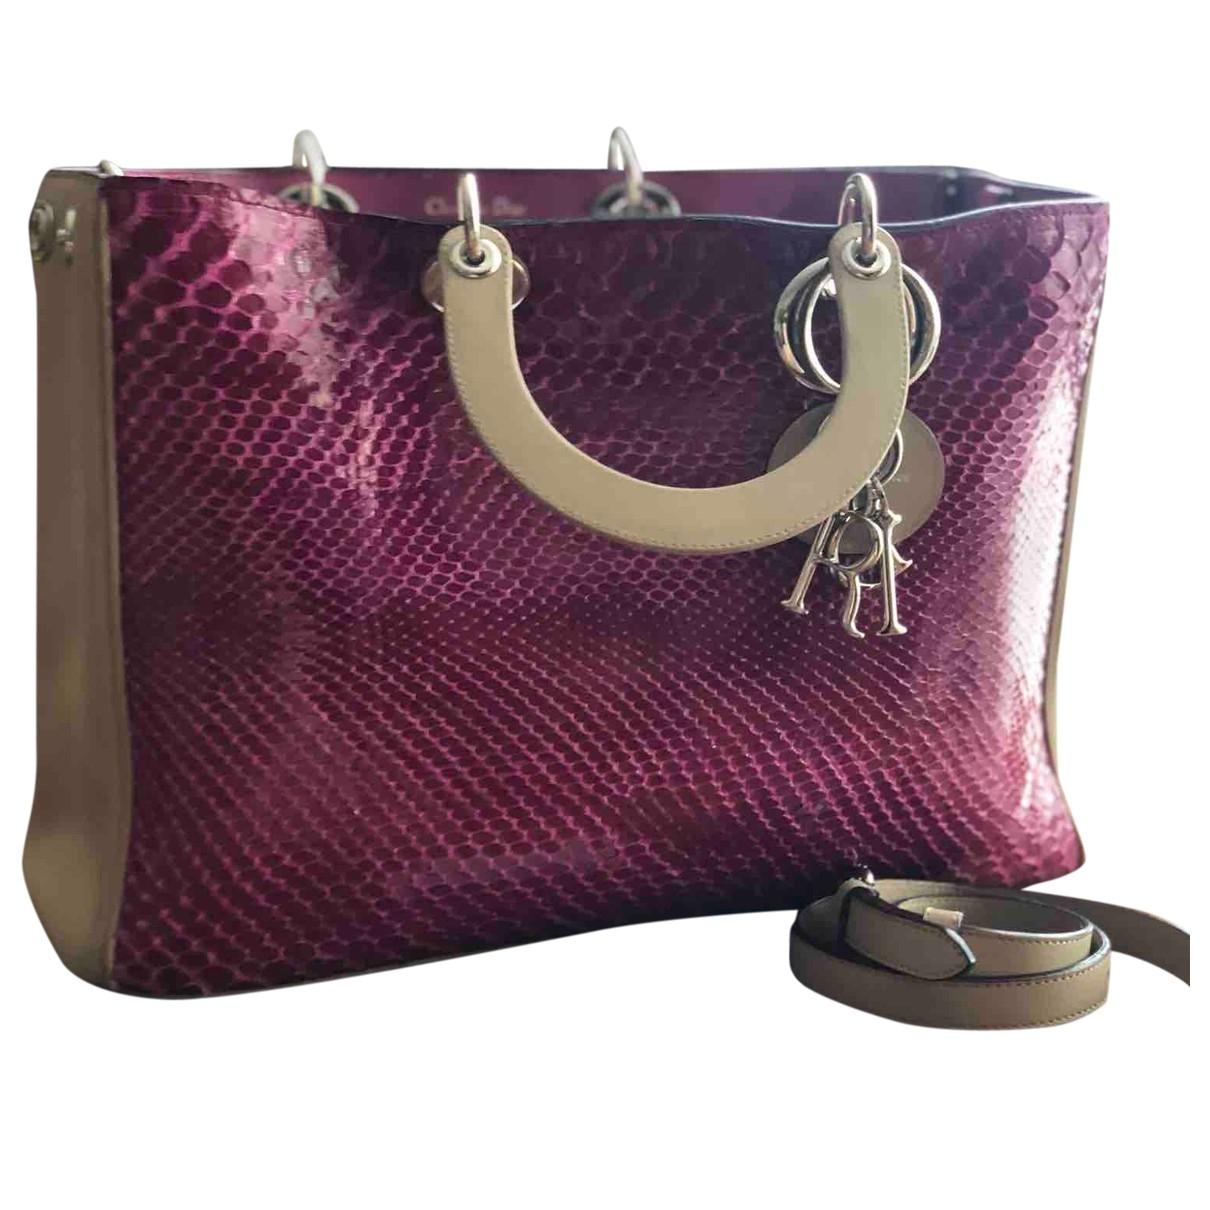 Dior Diorissimo Handtasche in  Lila Python